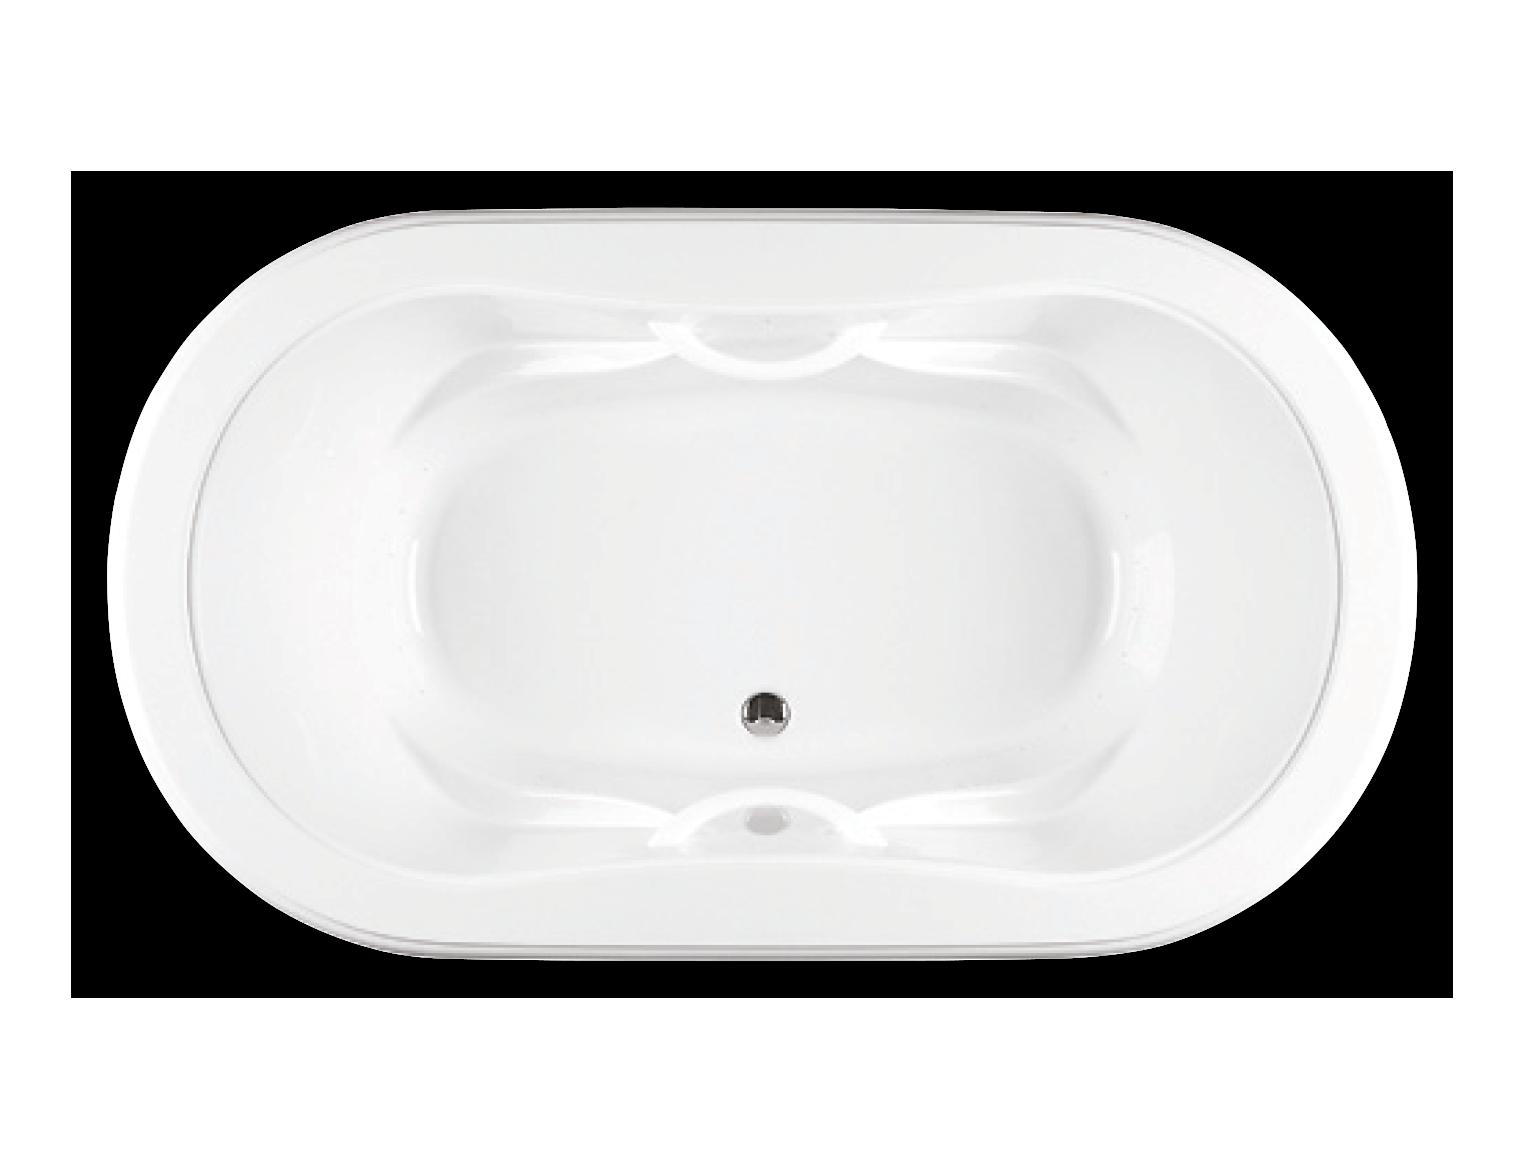 Bainultra Elegancia 7242 two person large air jet bathtub for your Victorian bathroom